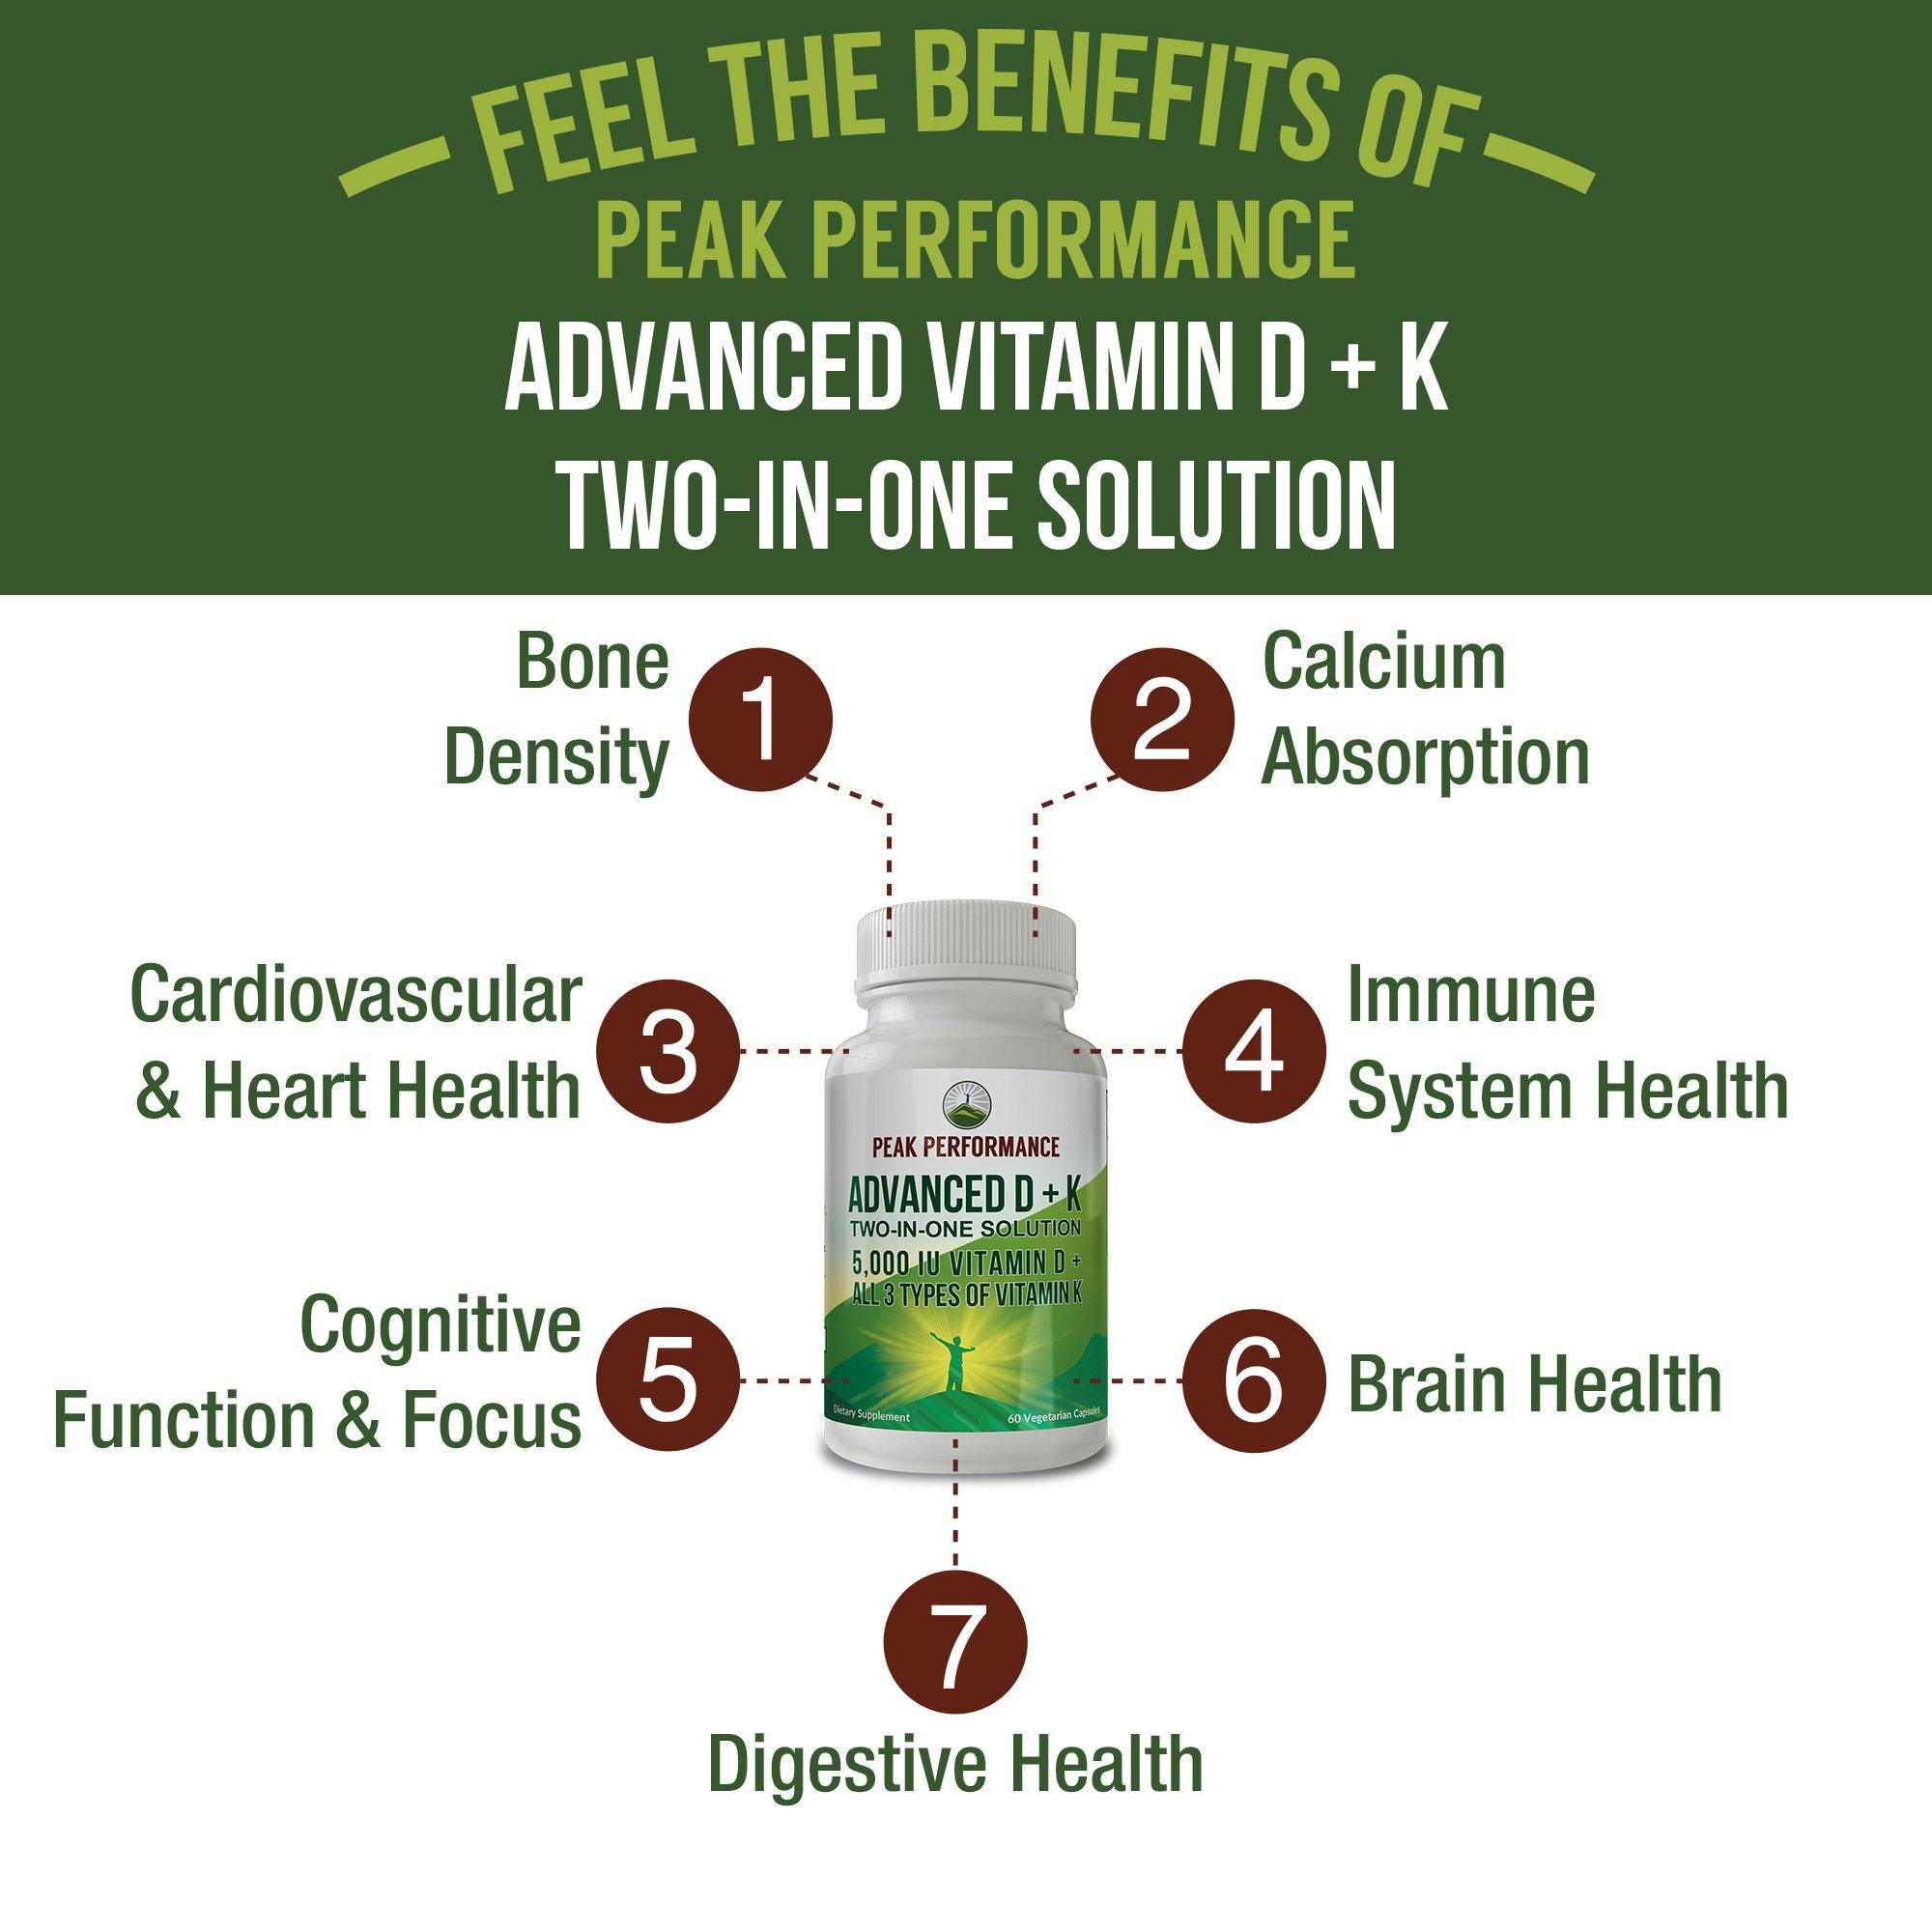 ADVANCED Vitamin D 5000 IU + ALL 3 Types Of Vitamin K By Peak Performance. Vitamin D3 and Vitamin K2 MK-7 (MK7) K2 MK4 K1 Supplement! 60 Small & Easy to Swallow Vegetable Capsules / Pills (5000 IU) by Peak Performance Coffee (Image #4)